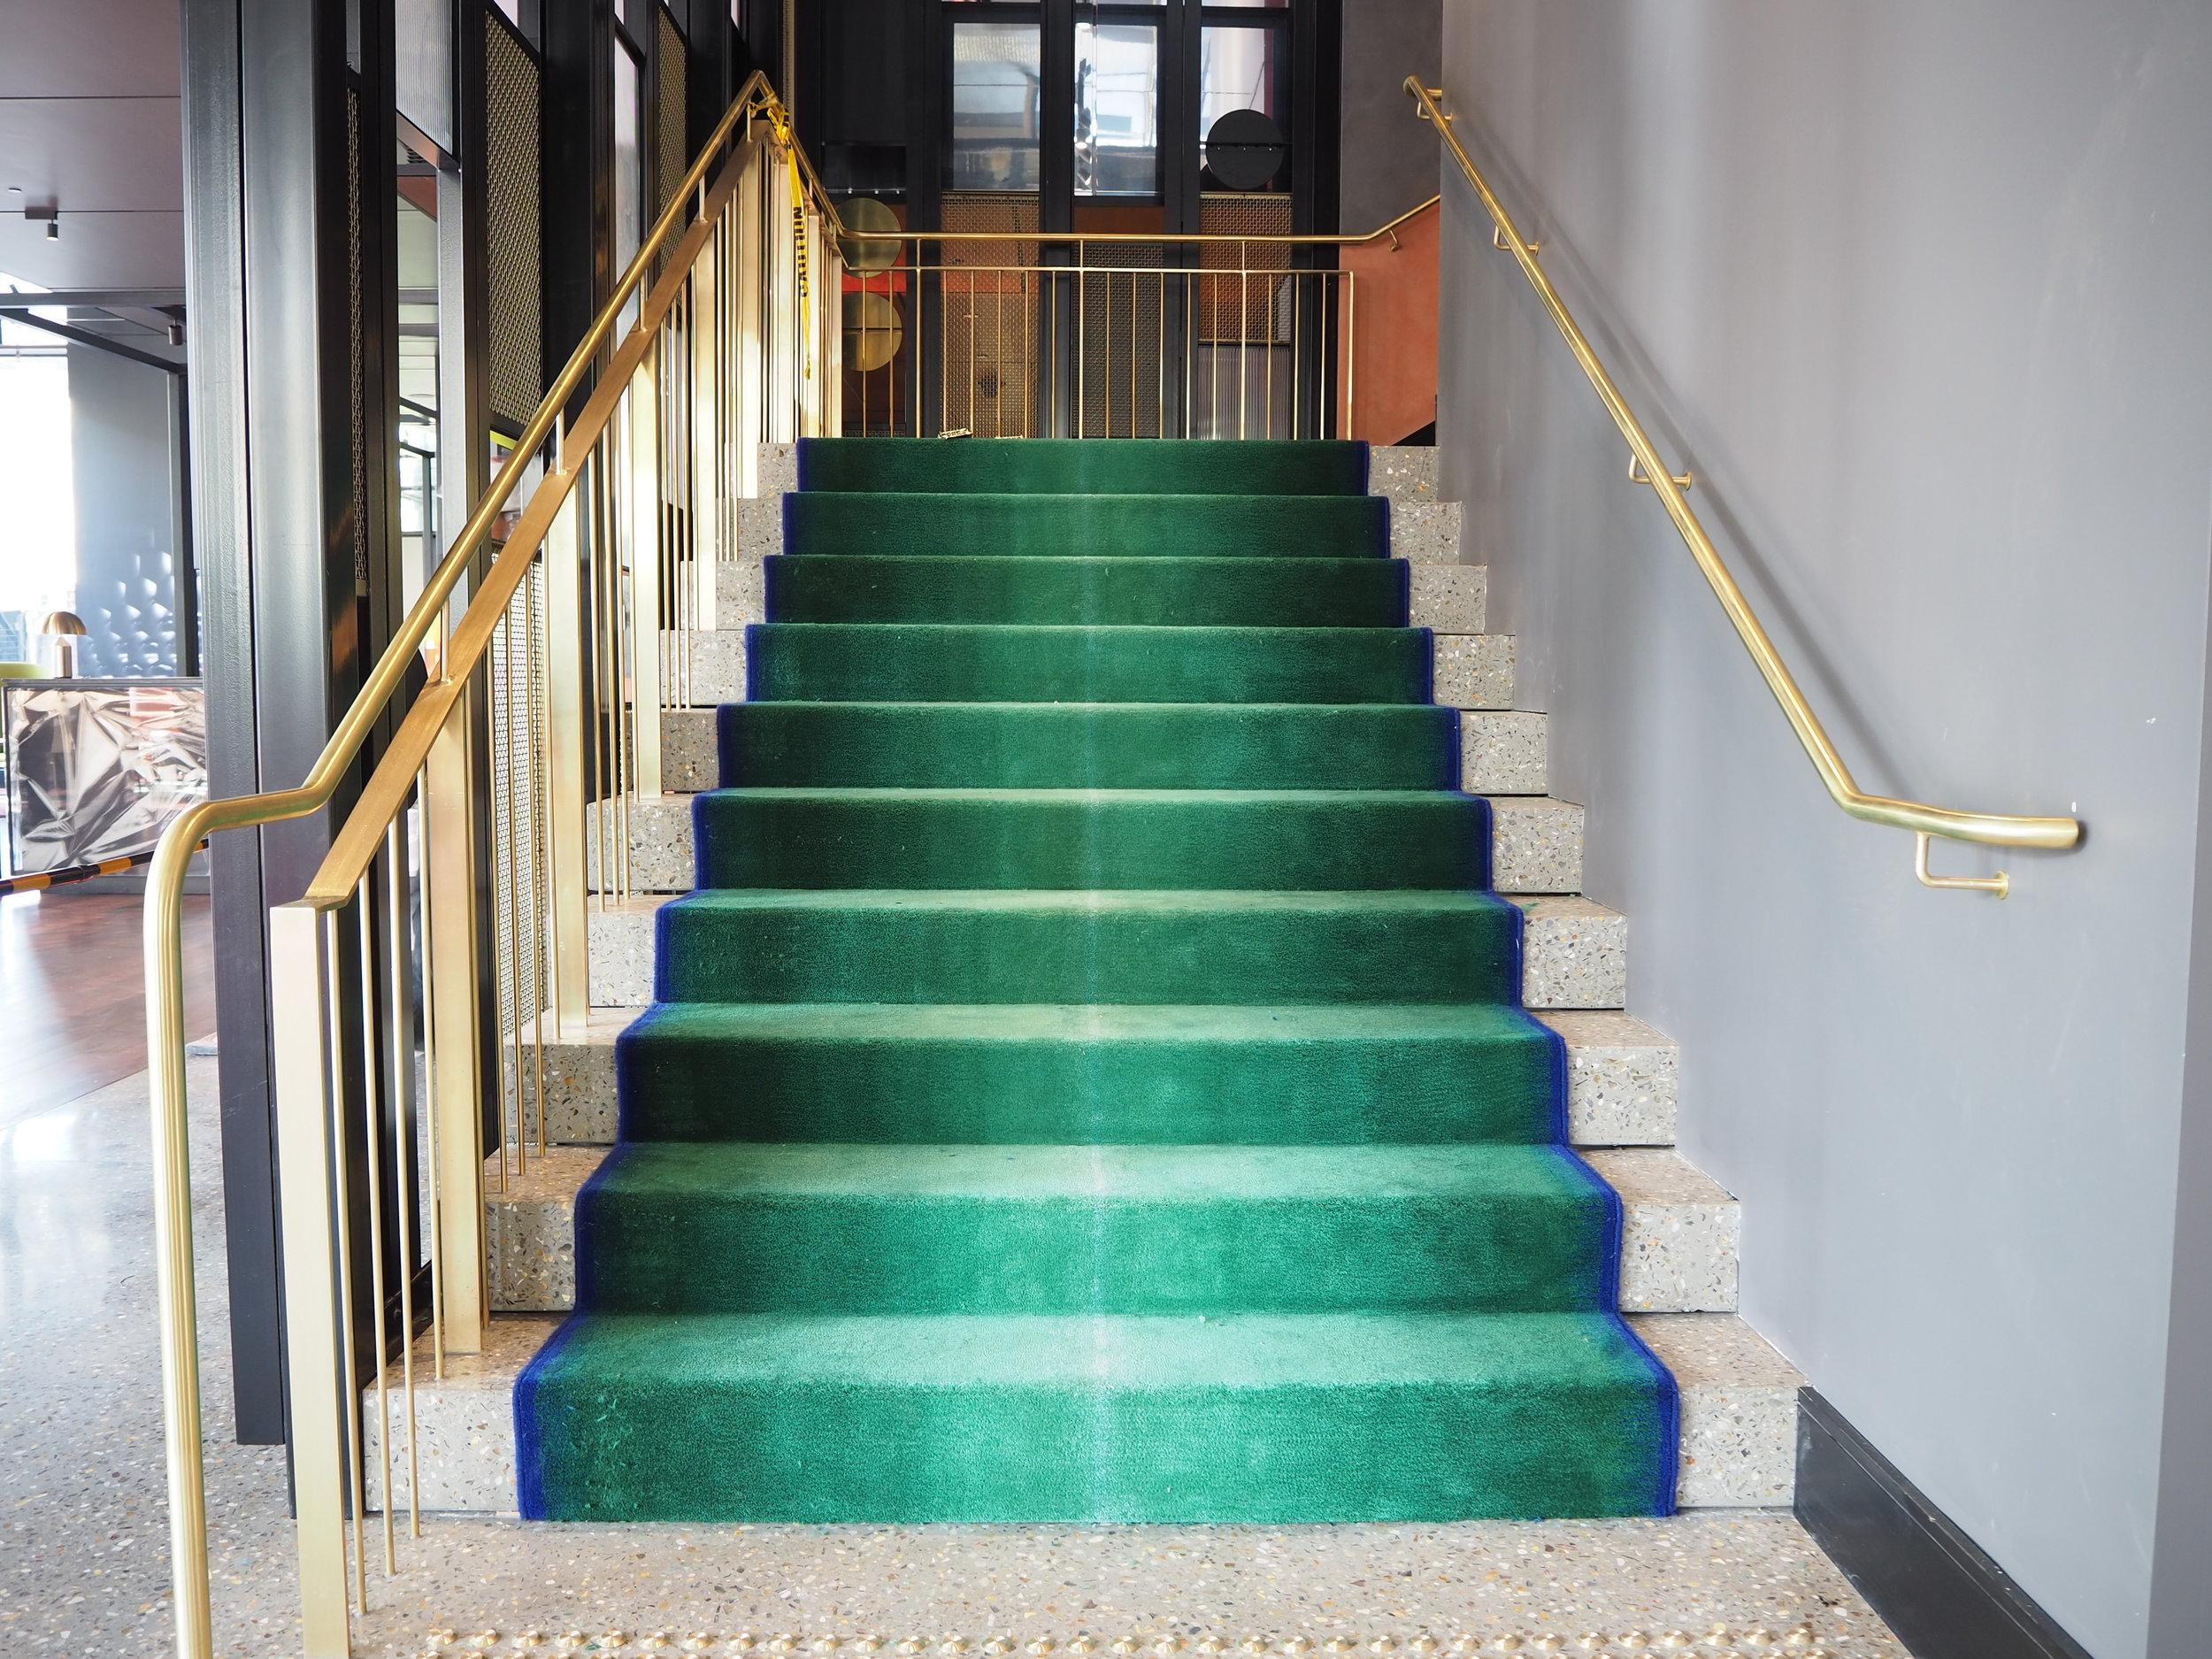 QT Hotel brass balustrade and handrail.JPG